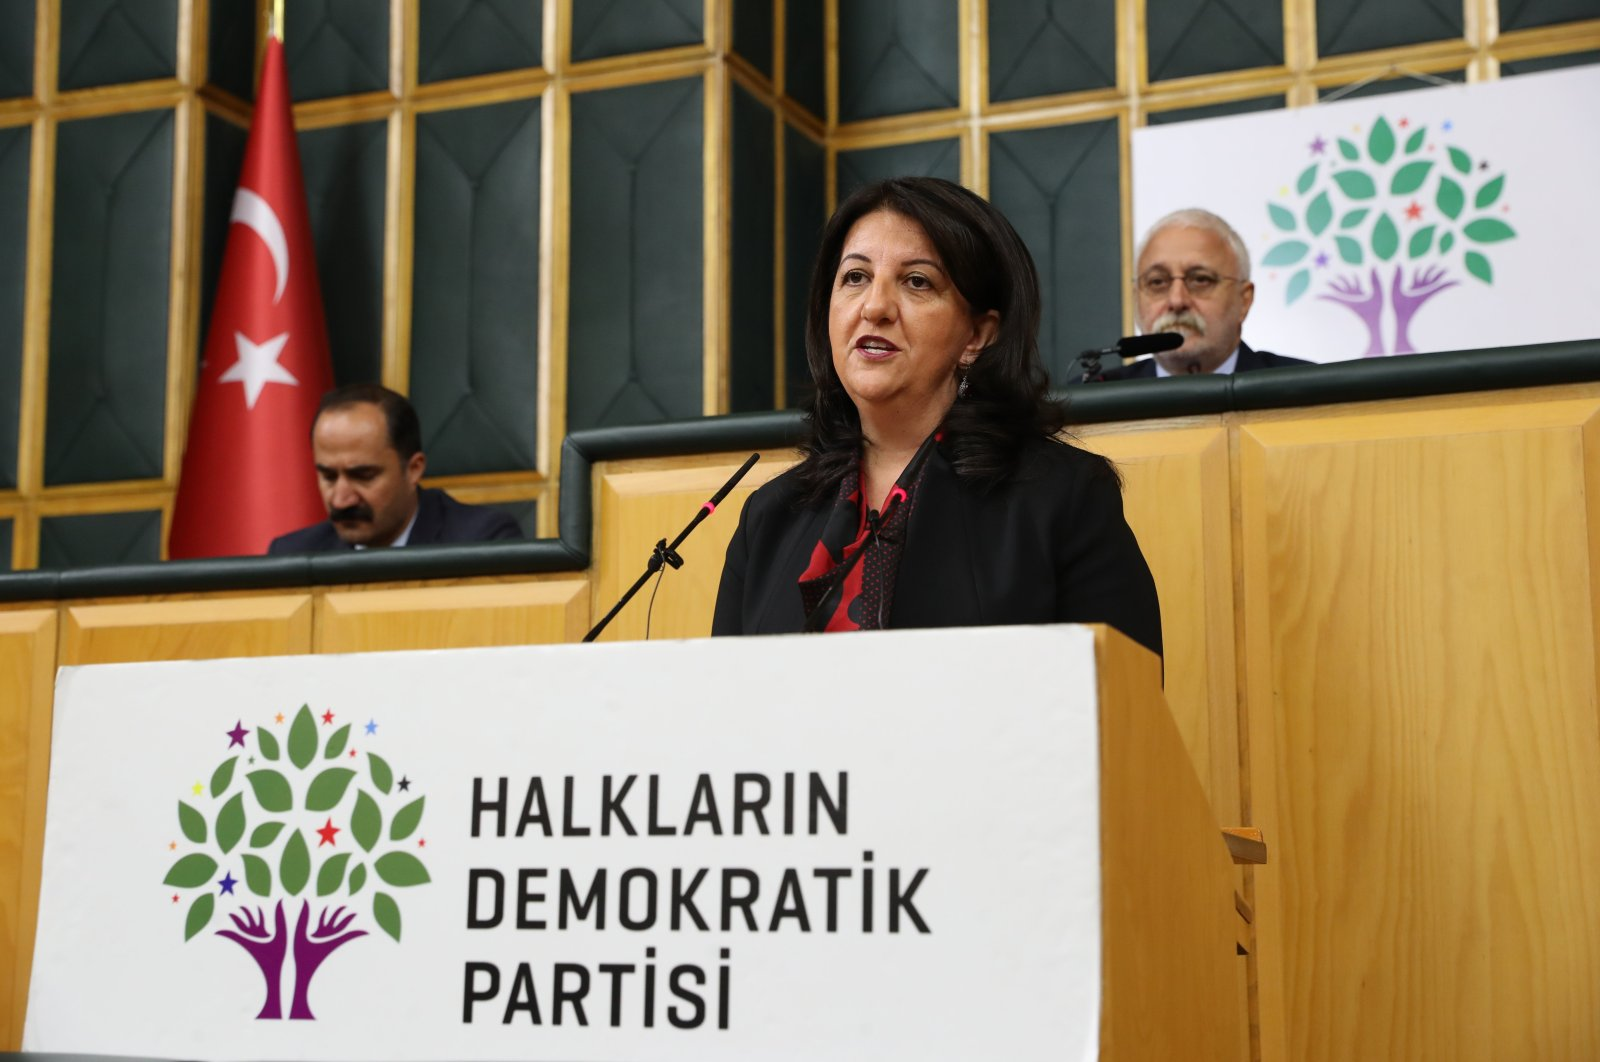 HDP Co-Chair Pervin Buldan speaks at her party's group meeting in Ankara, Turkey, Nov. 15, 2019. (Photo by Ali Ekeyılmaz)